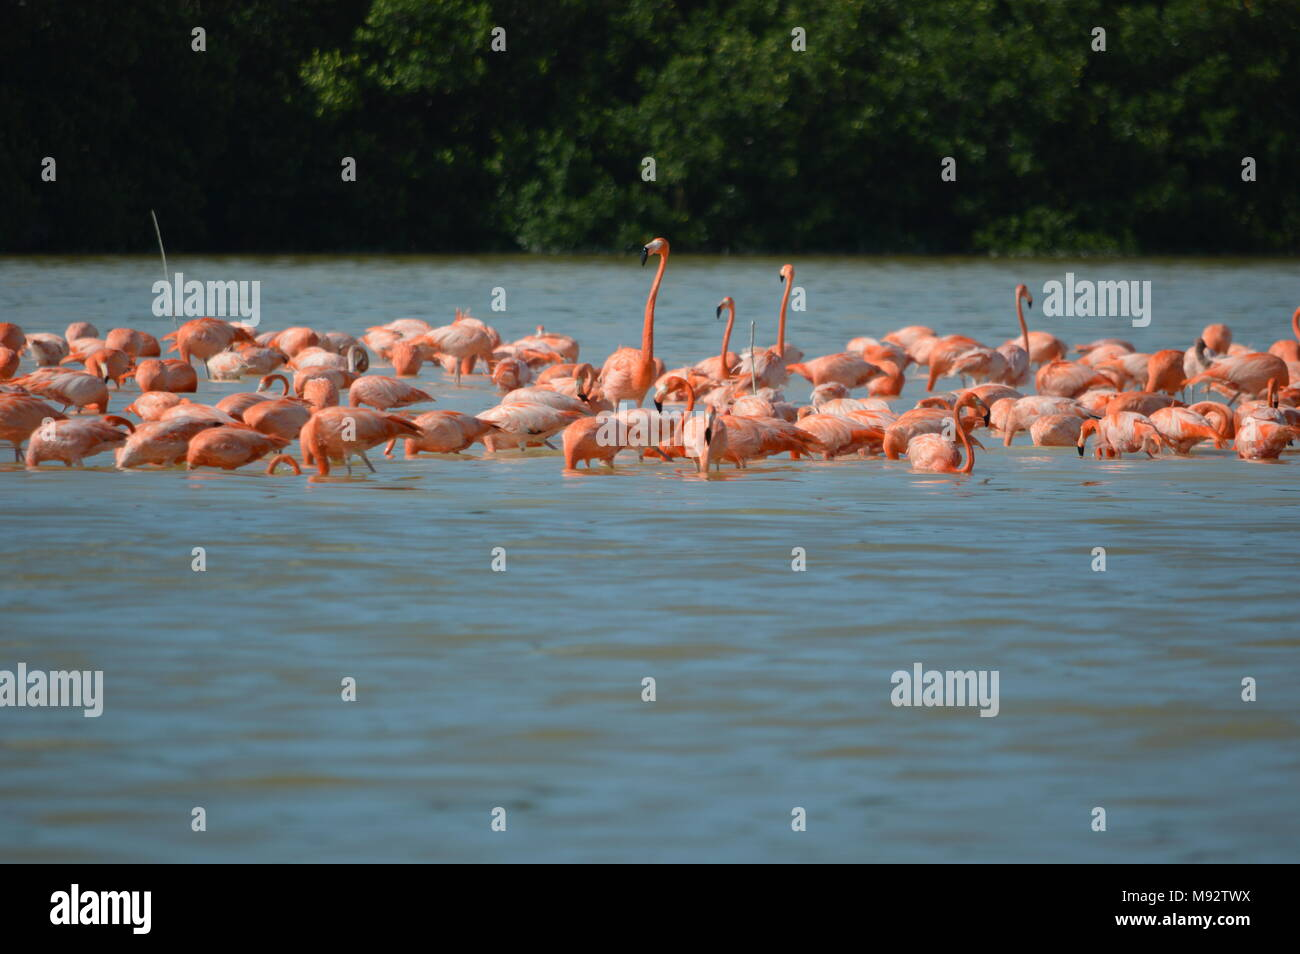 A group of American flamingos in Celestun, Mexico - Stock Image